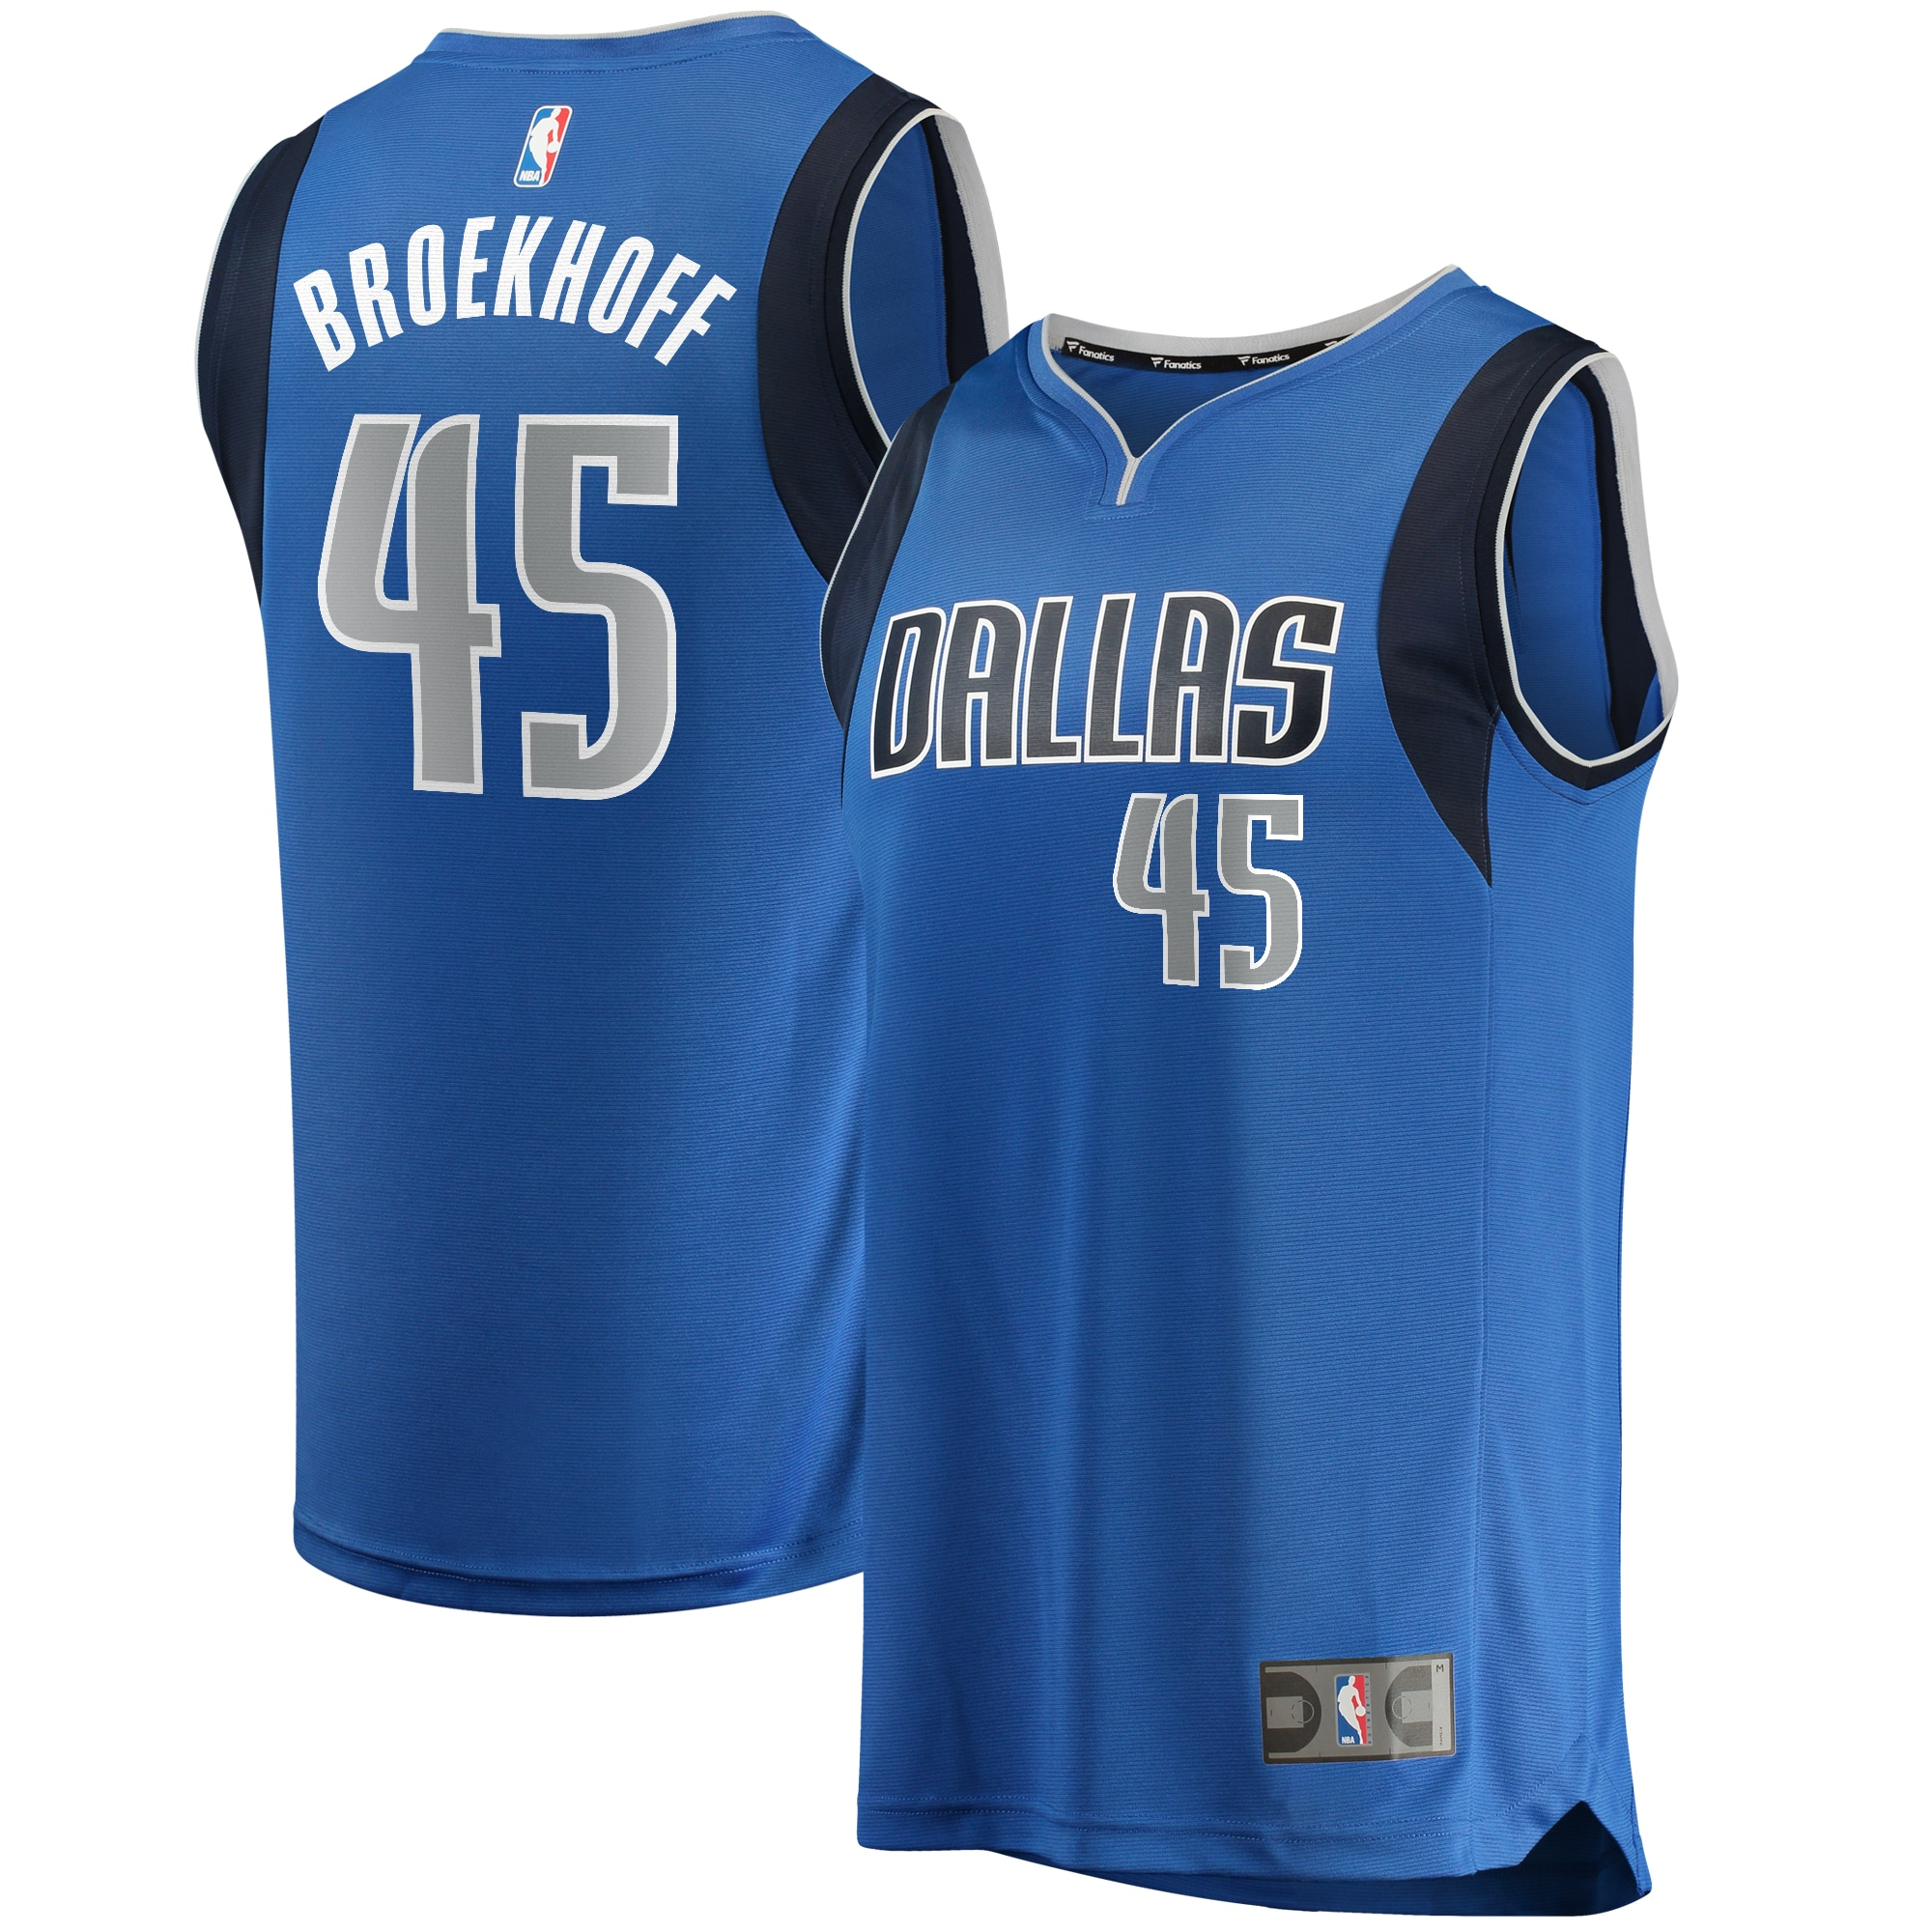 Ryan Broekhoff Dallas Mavericks Fanatics Branded Fast Break Player Replica Jersey - Icon Edition - Blue